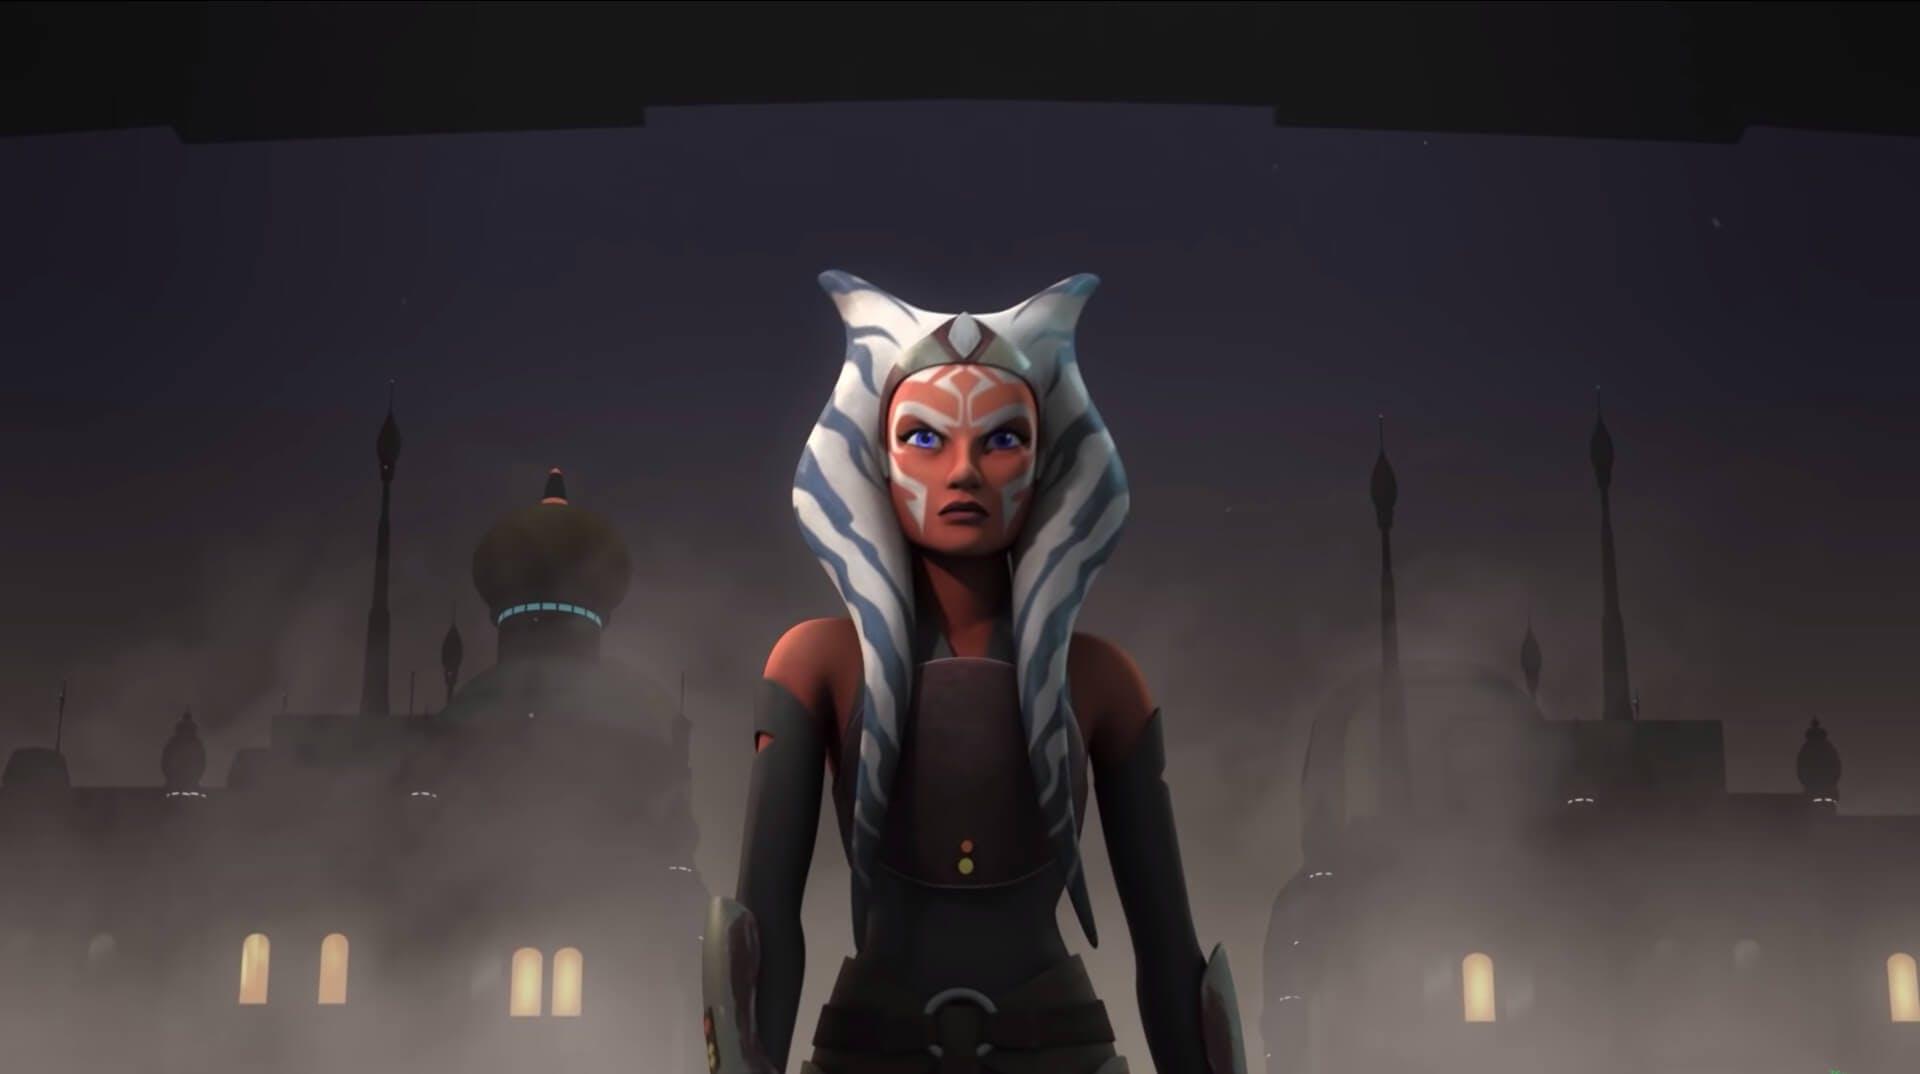 An image showing Ahsoka Tano from Star Wars